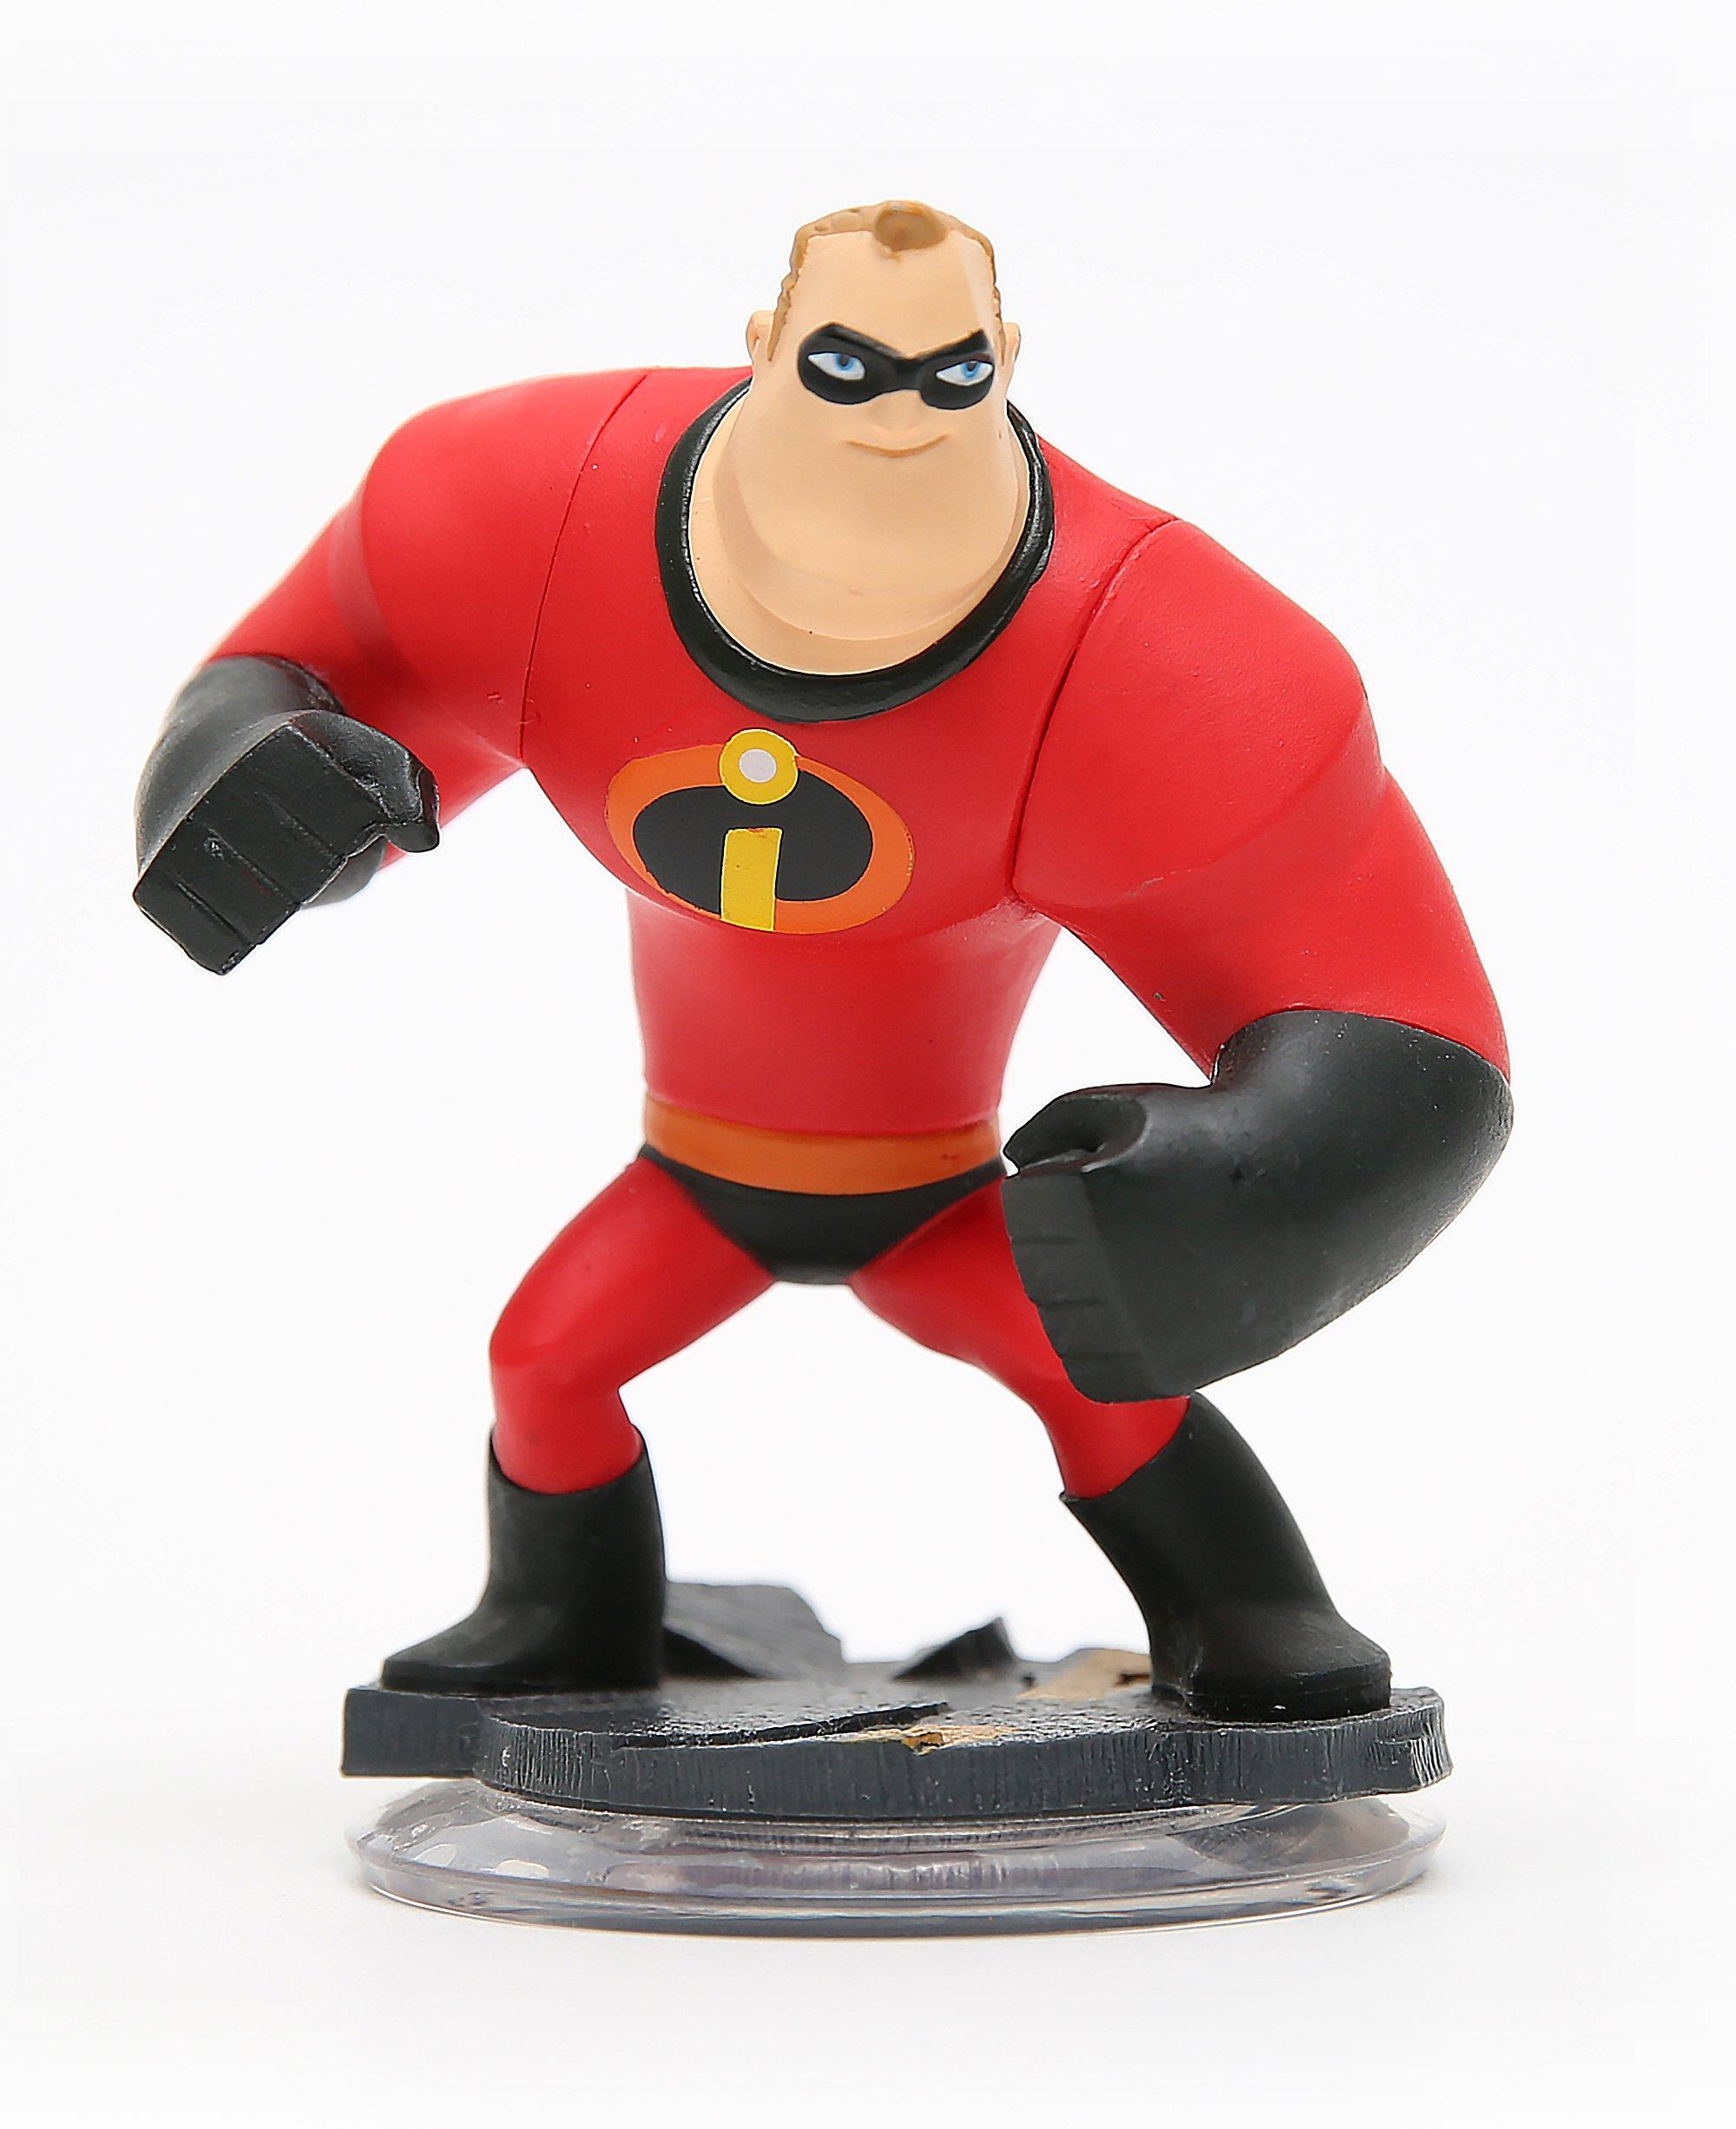 Disney INFINITY Mr. Incredible Figure | Disney Interactive ...